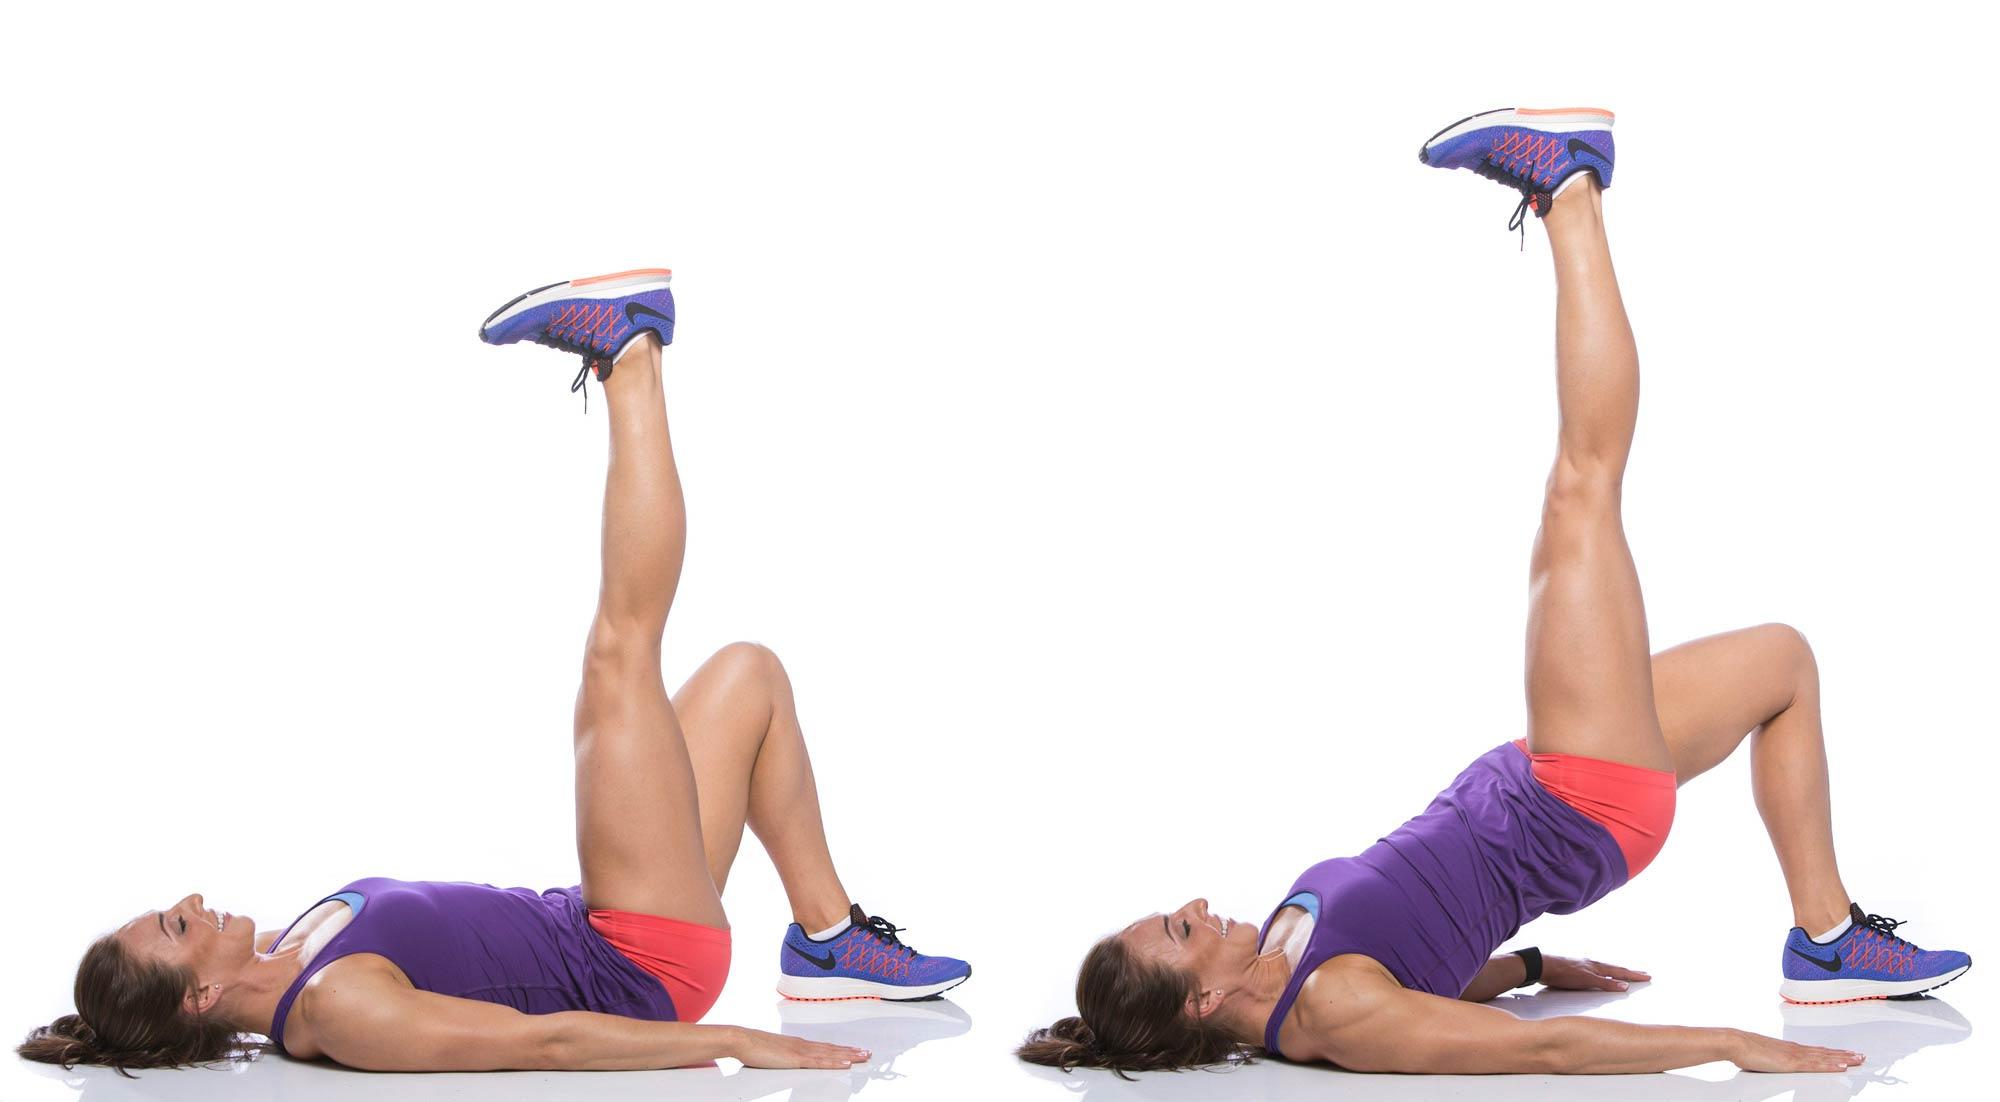 Butt workouts for women straight leg upward glute bridge